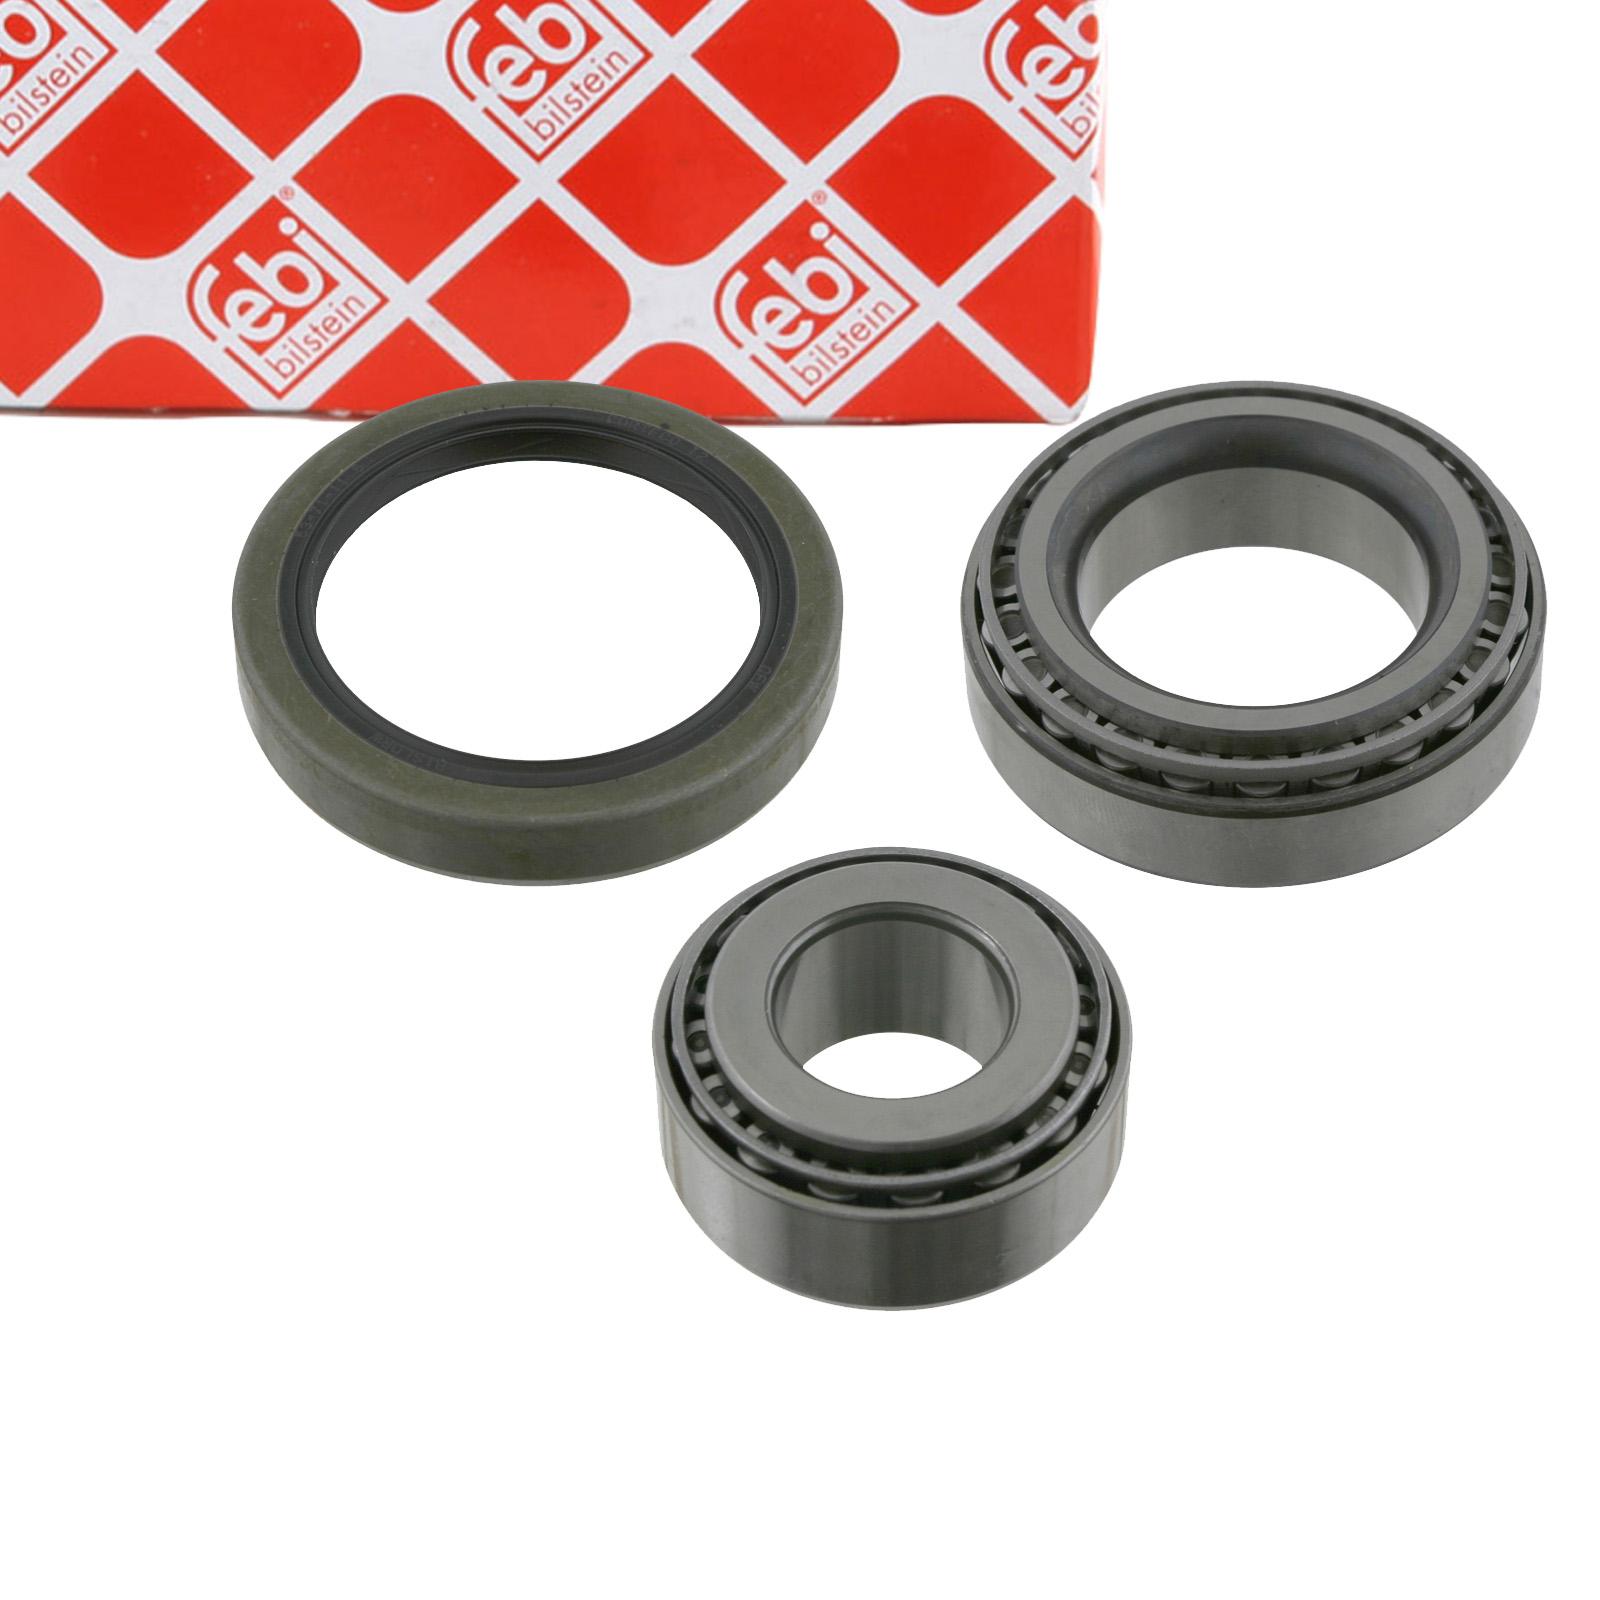 FEBI 05415 Radlagersatz Radlager MERCEDES W140 S280-600 S300/350 Turbo-D vorne A1403300051